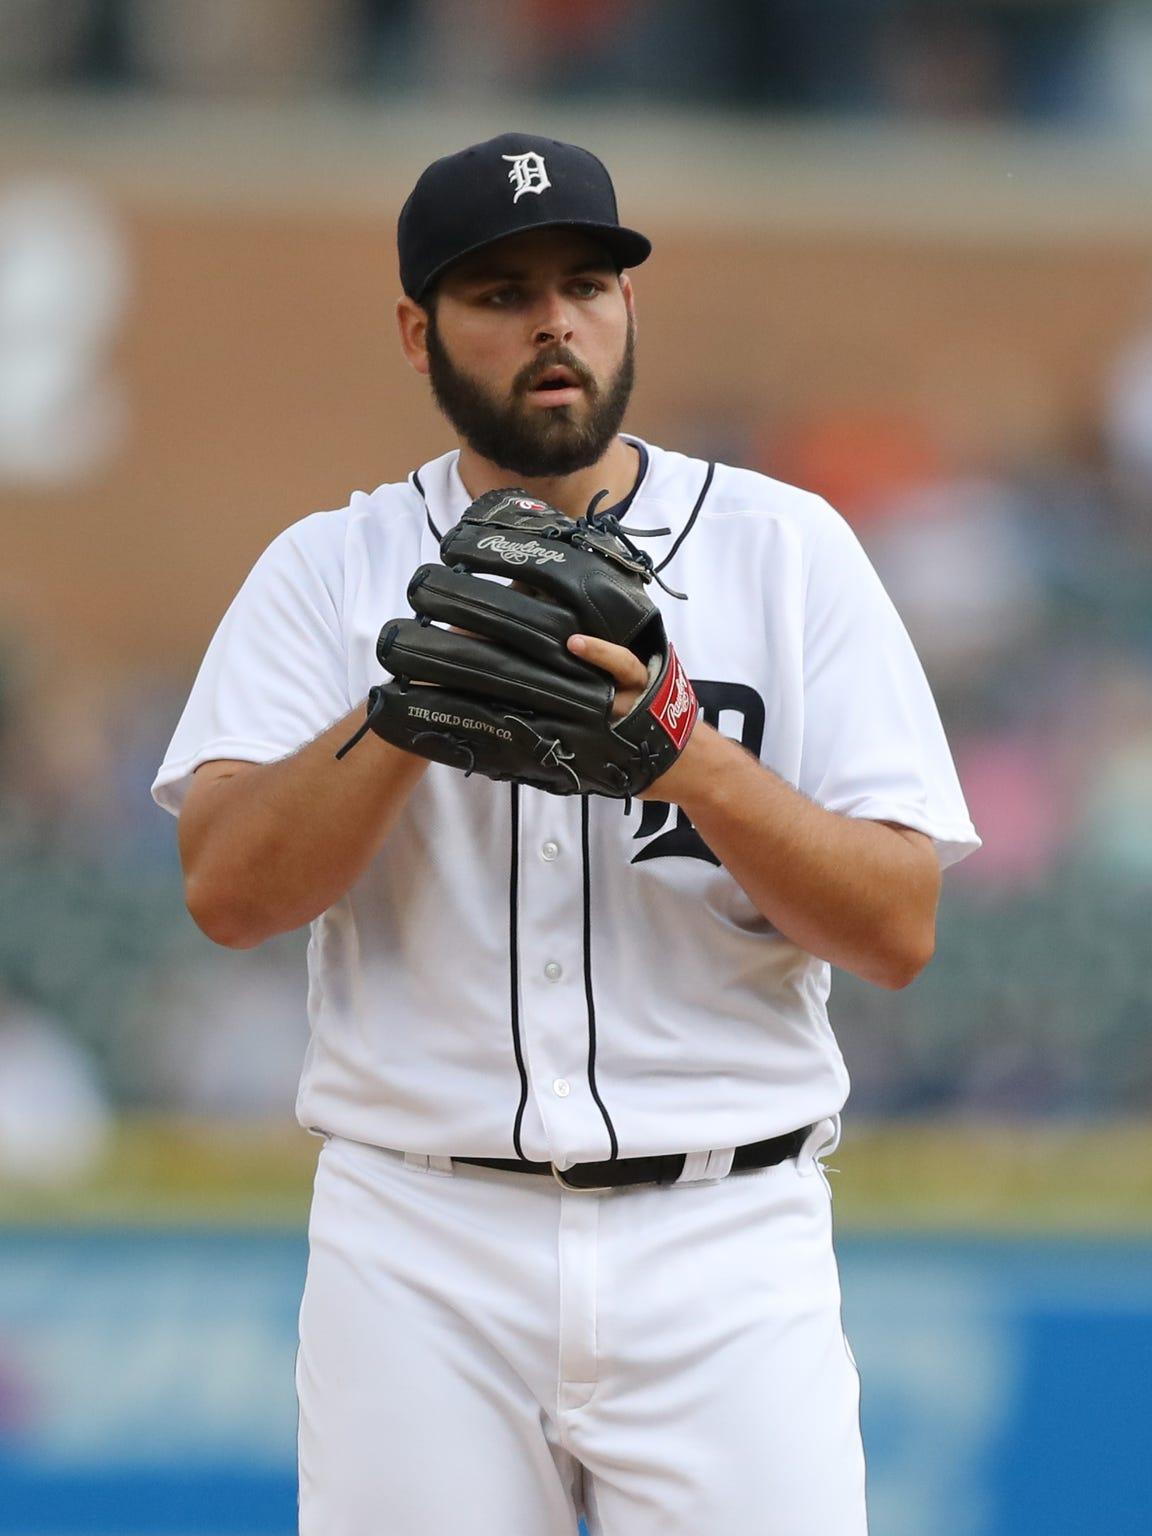 Tigers pitcher Michael Fulmer.